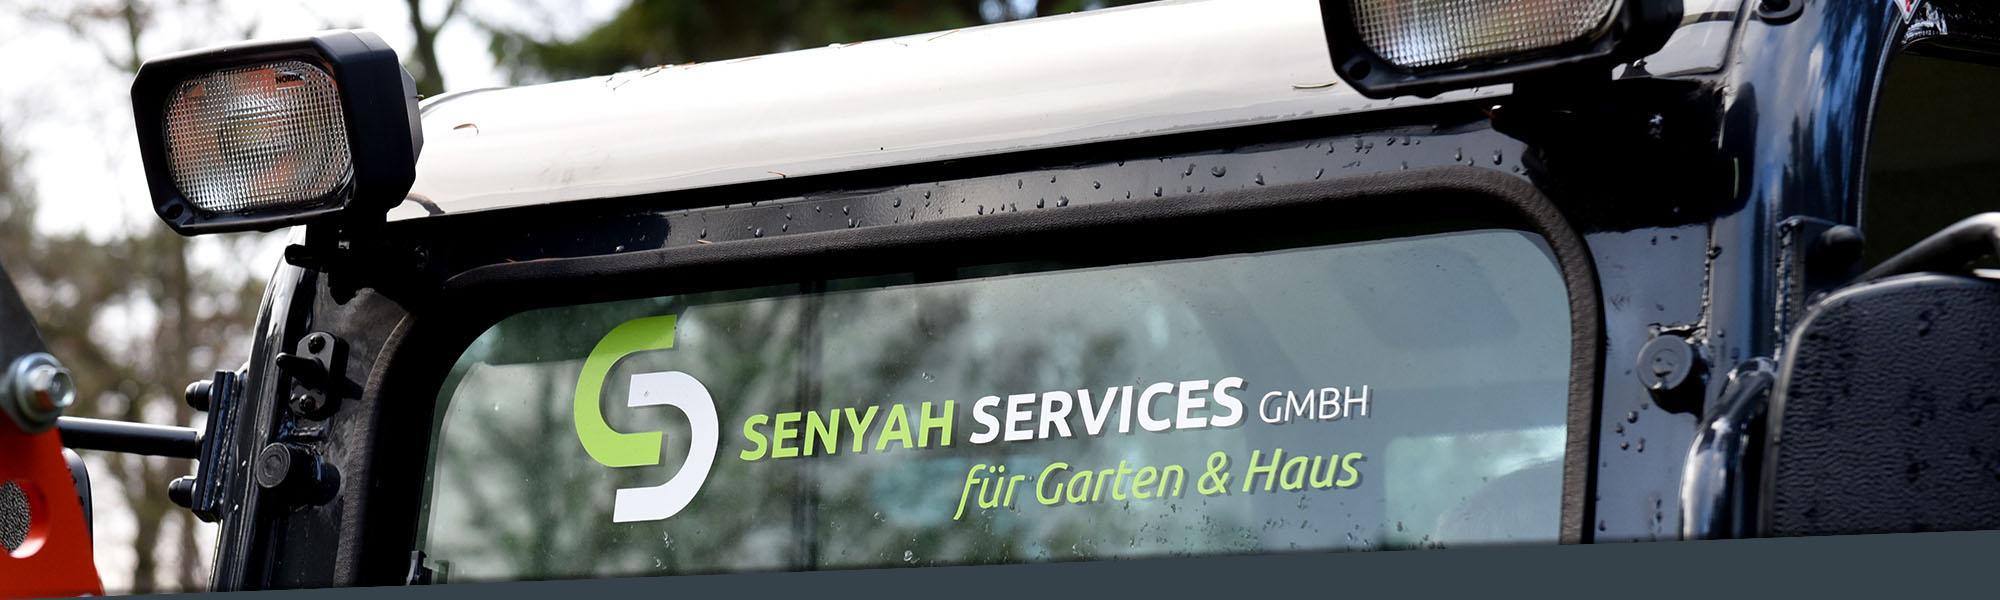 Senyah-Services